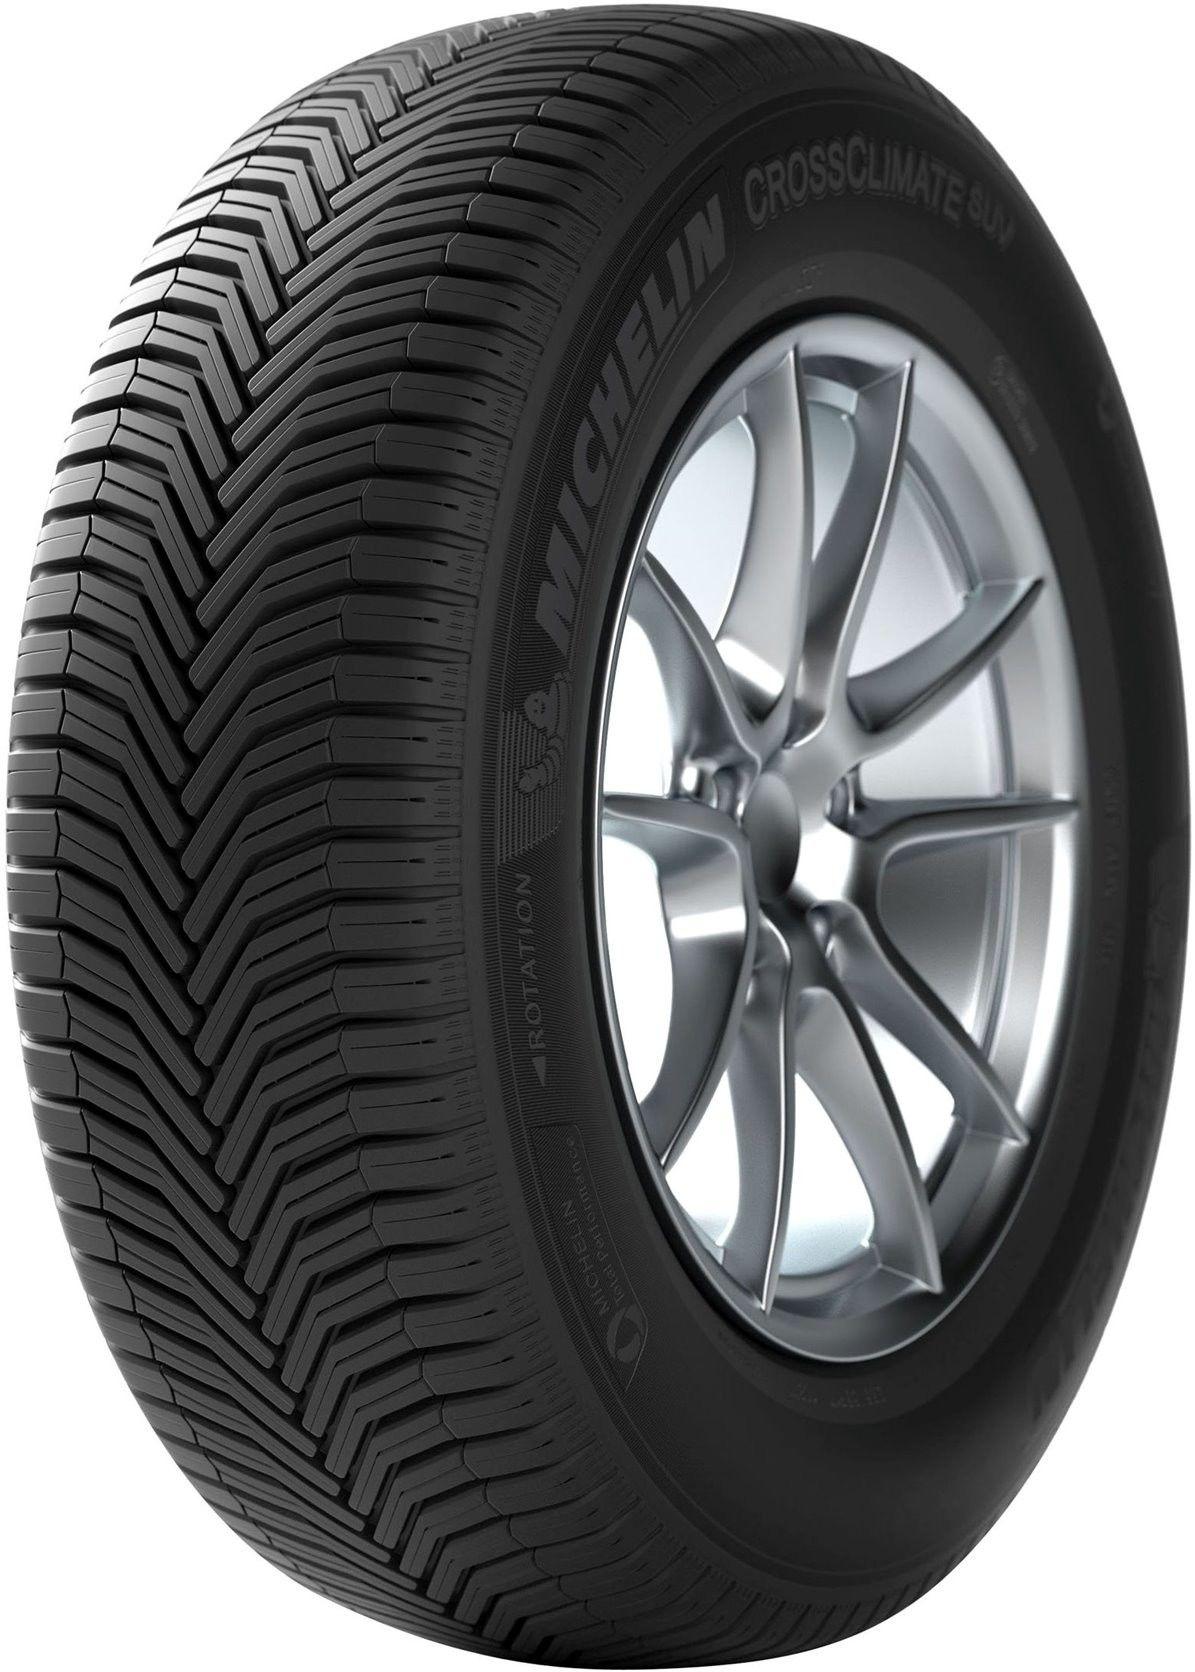 Michelin CROSSCLIMATE 235/55 R18 104 V